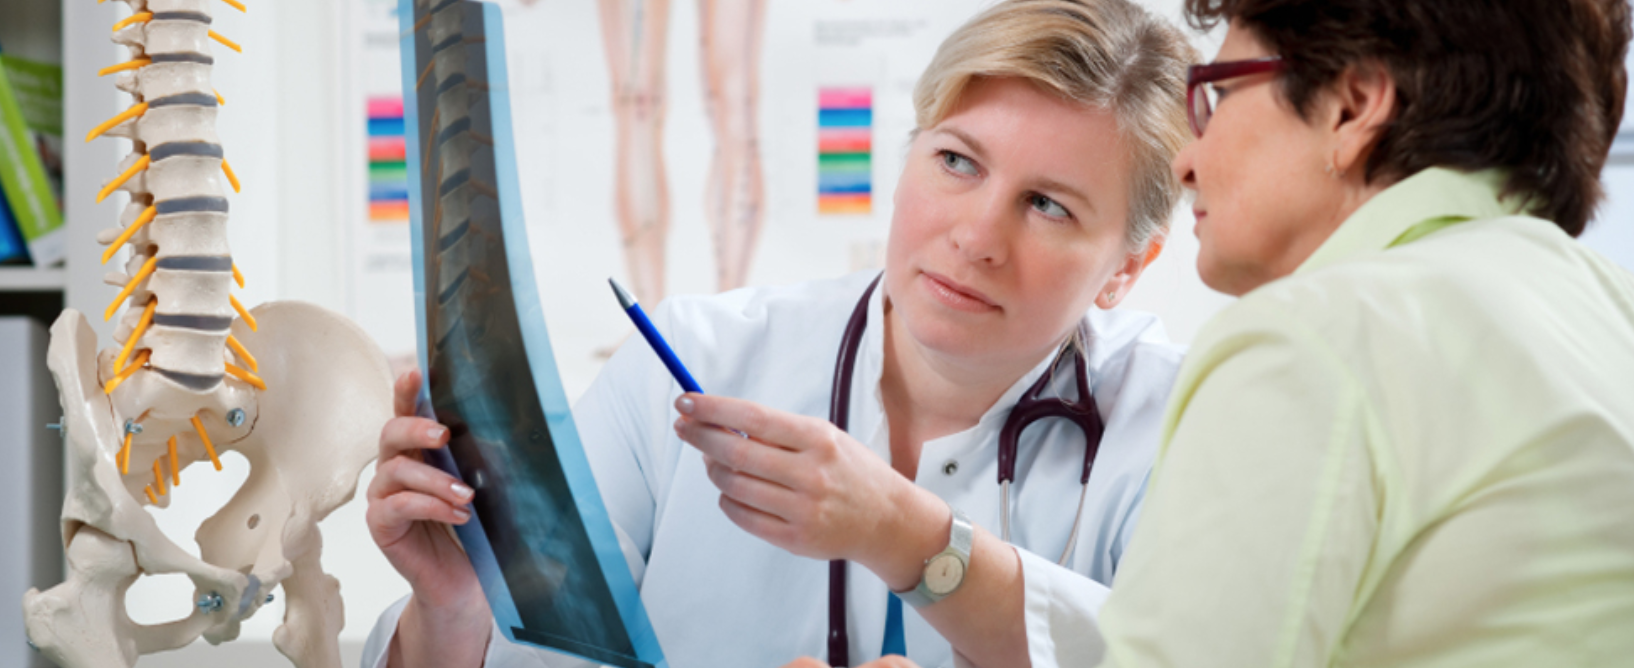 SEO for Orthopedic Surgeons